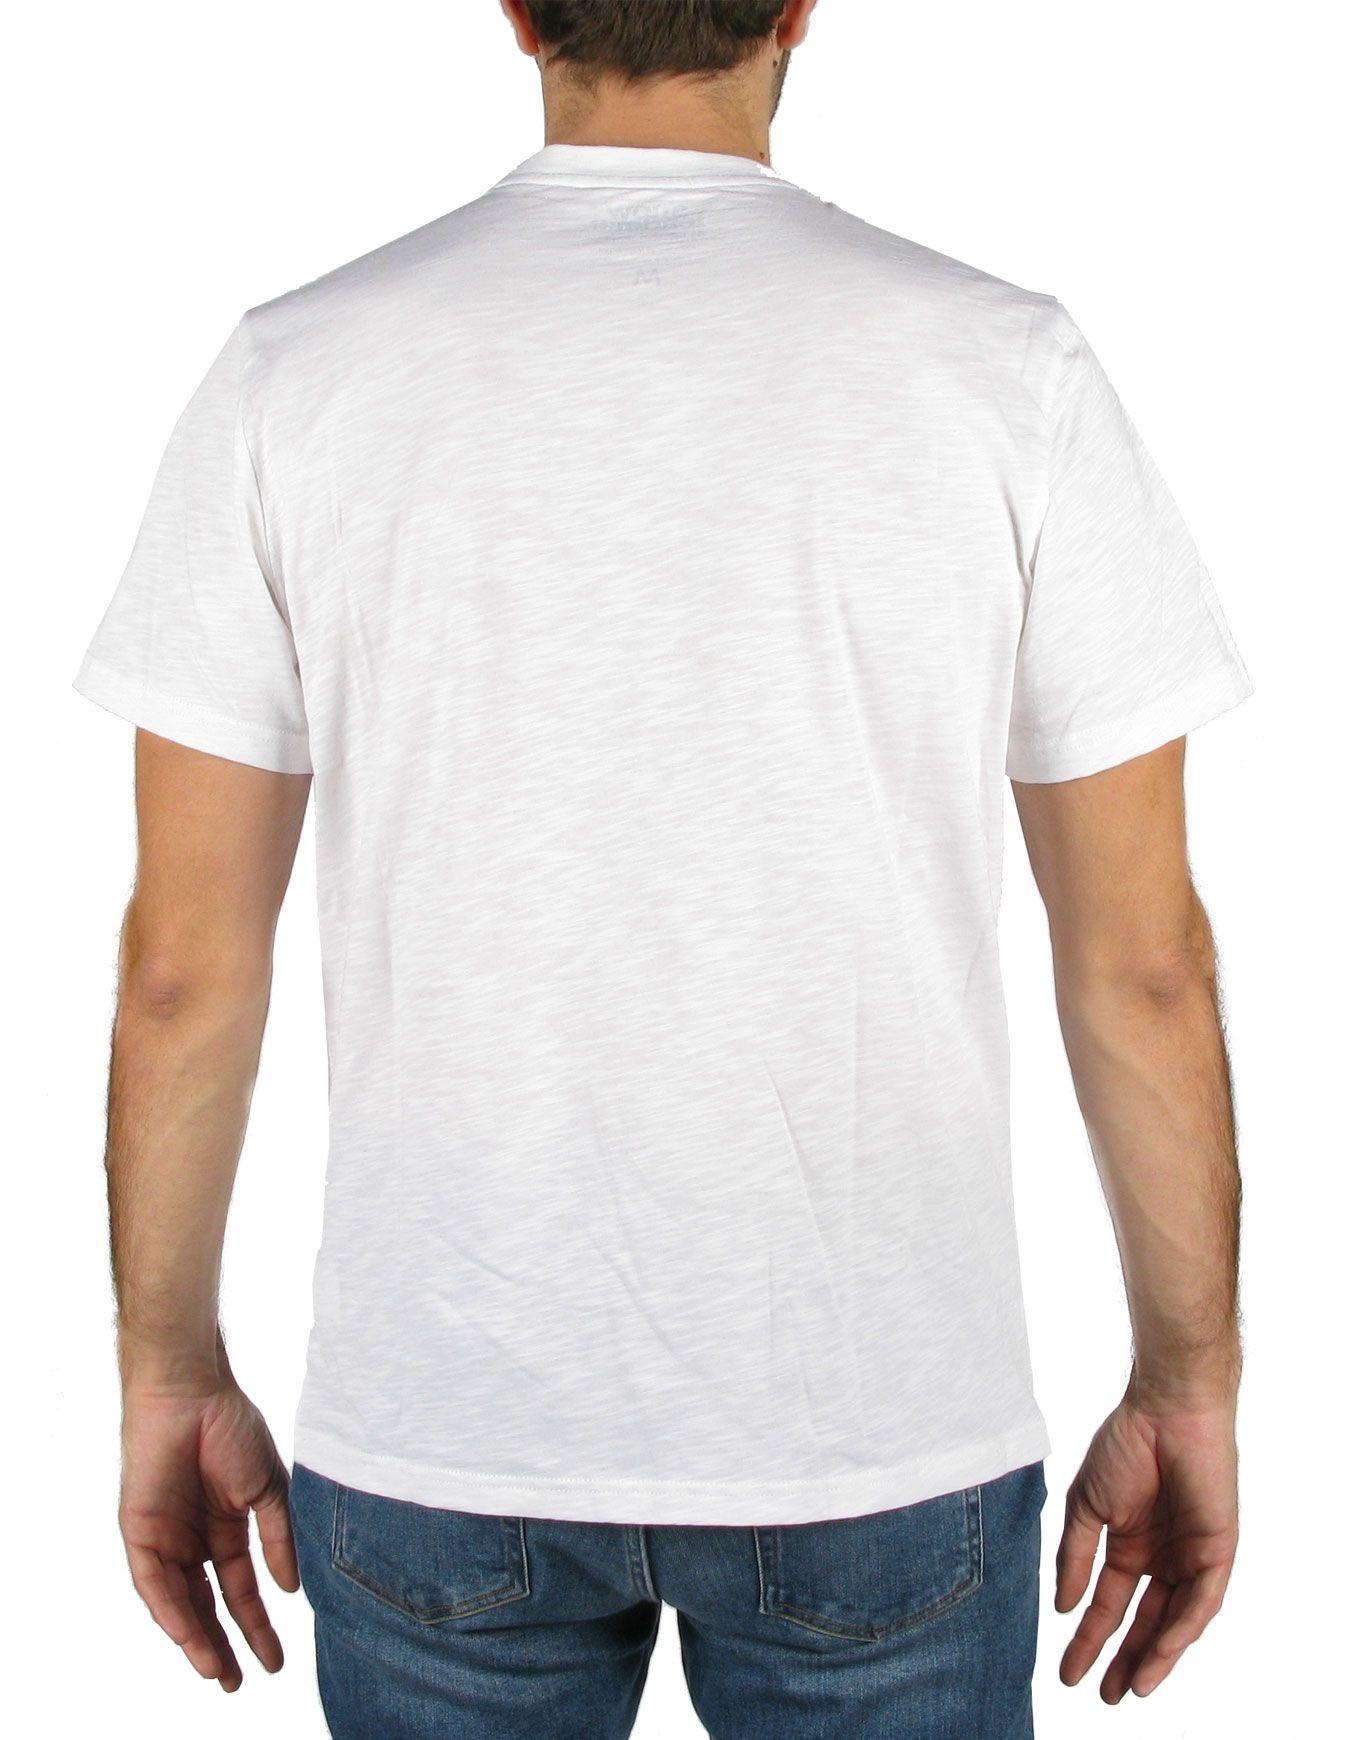 snowleader t shirt mountain kit blanc t shirts snowleader. Black Bedroom Furniture Sets. Home Design Ideas